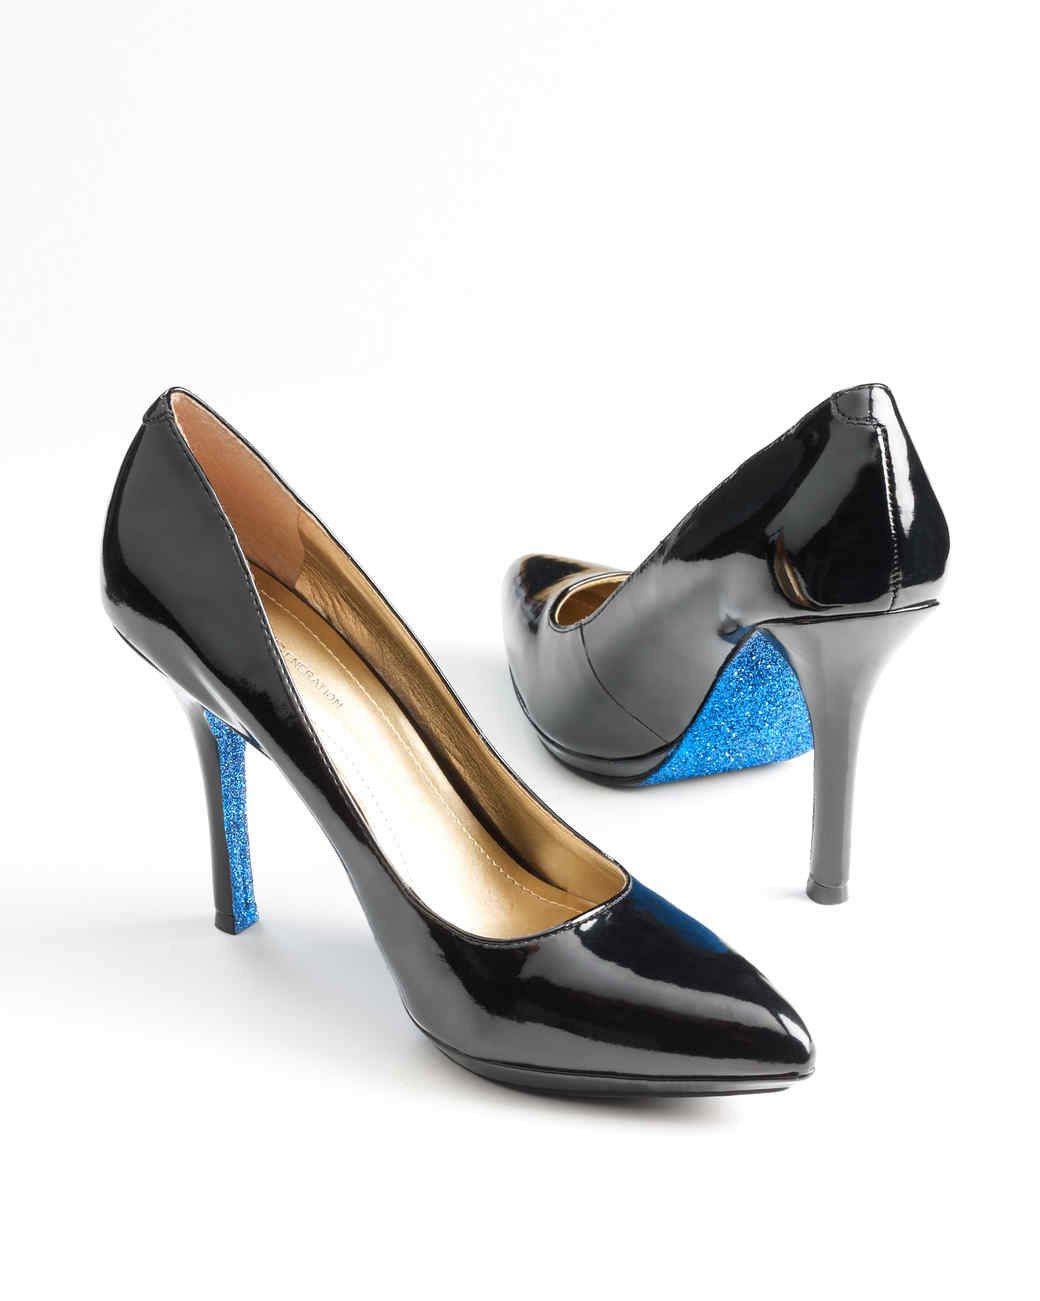 mscrafts-holiday14-fashionista-blueshoe-1014.jpg